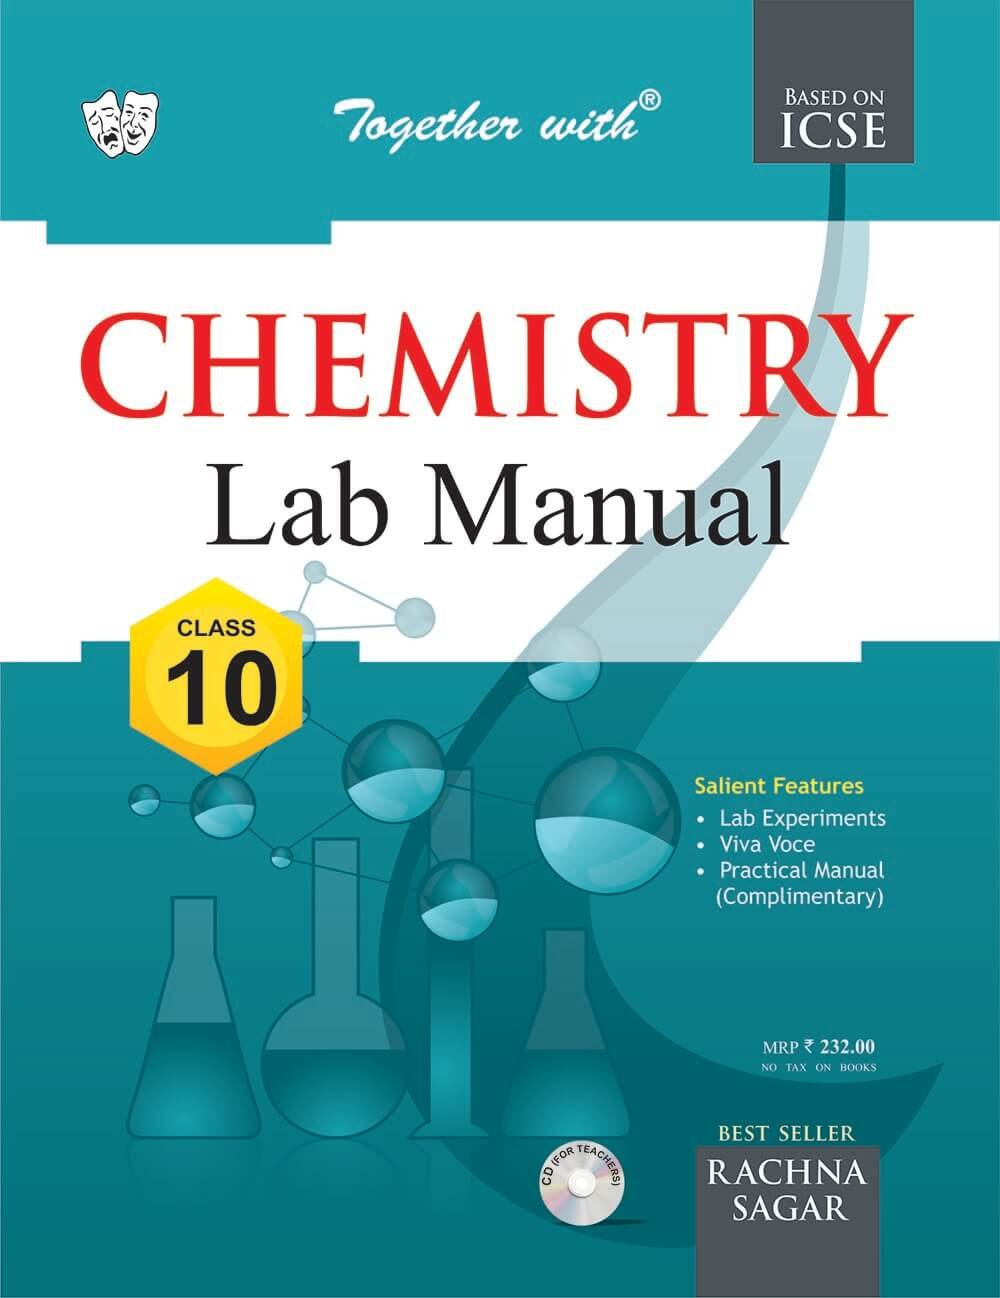 Together With ICSE Lab Manual Chemistry - 10: Amazon.in: Rachna Sagar: Books